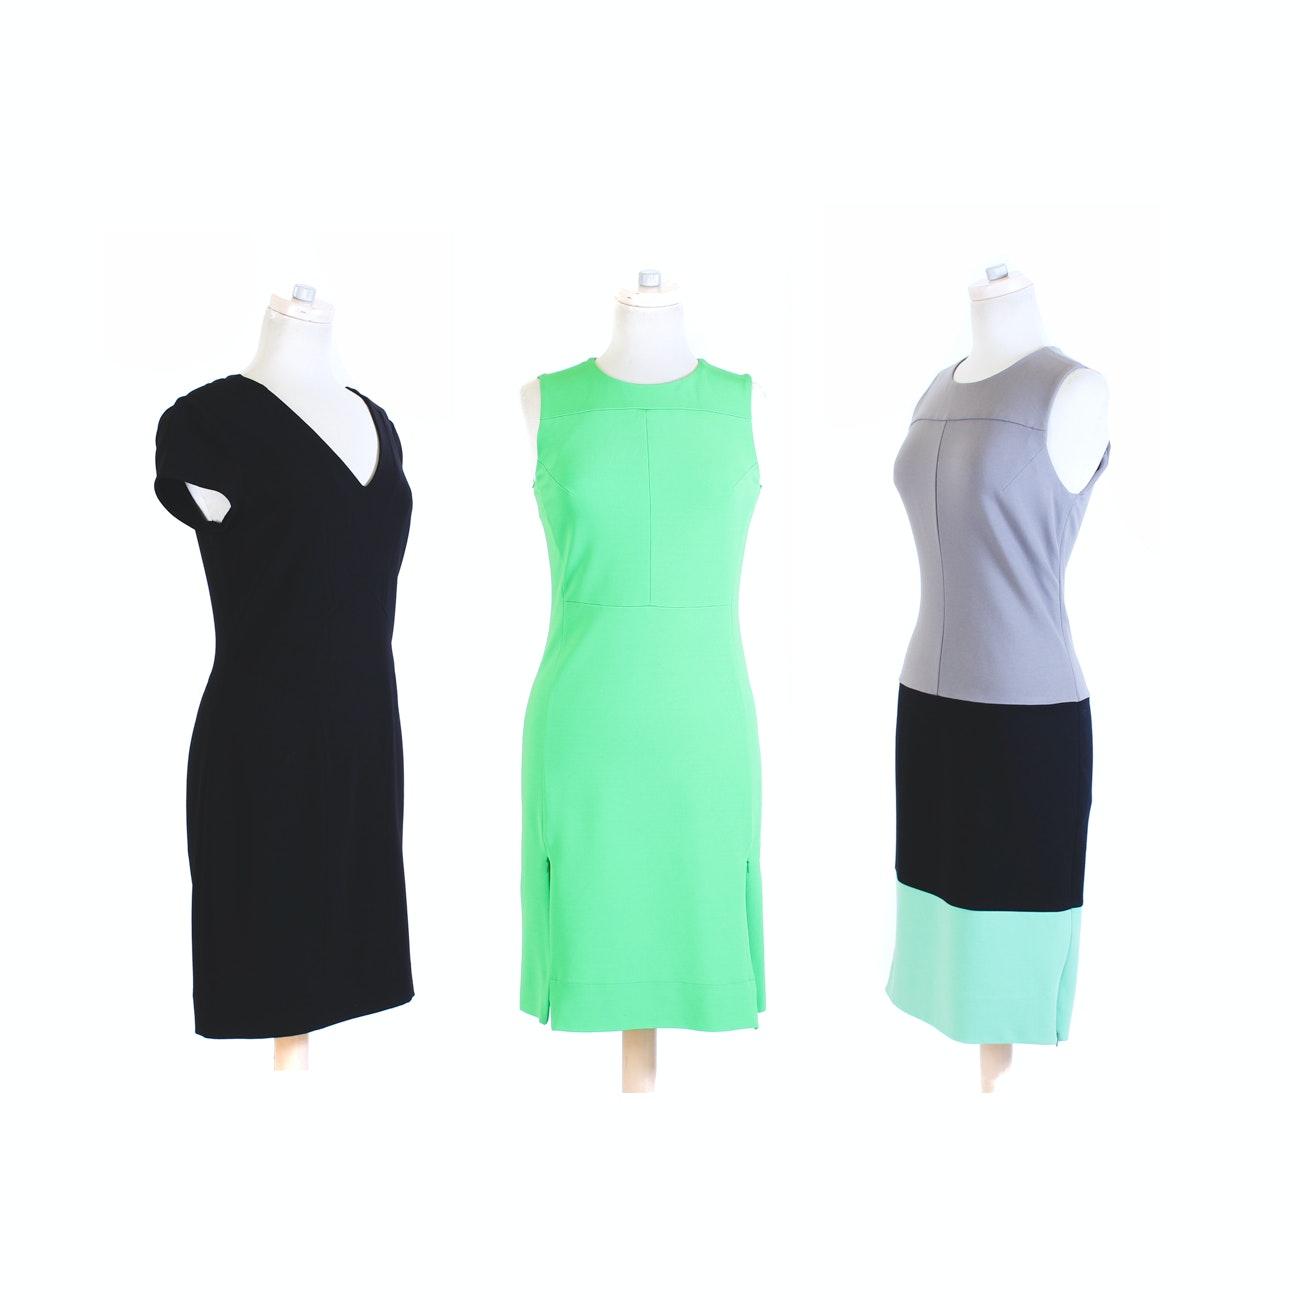 Diane von Furstenberg Contemporary Dresses